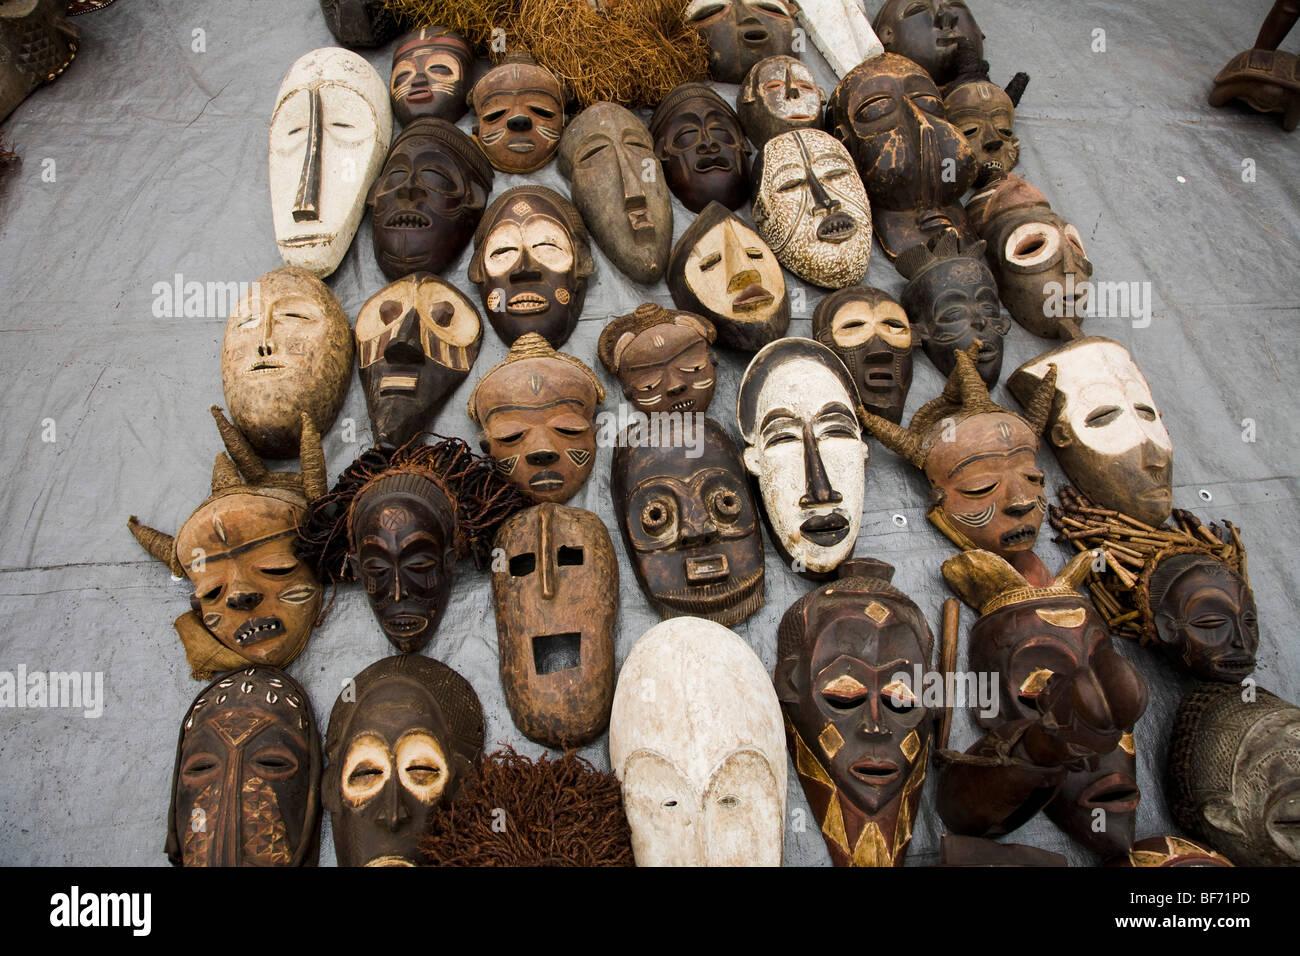 african masks for sale at the rose bowl swap meet pasadena stock photo royalty free image. Black Bedroom Furniture Sets. Home Design Ideas